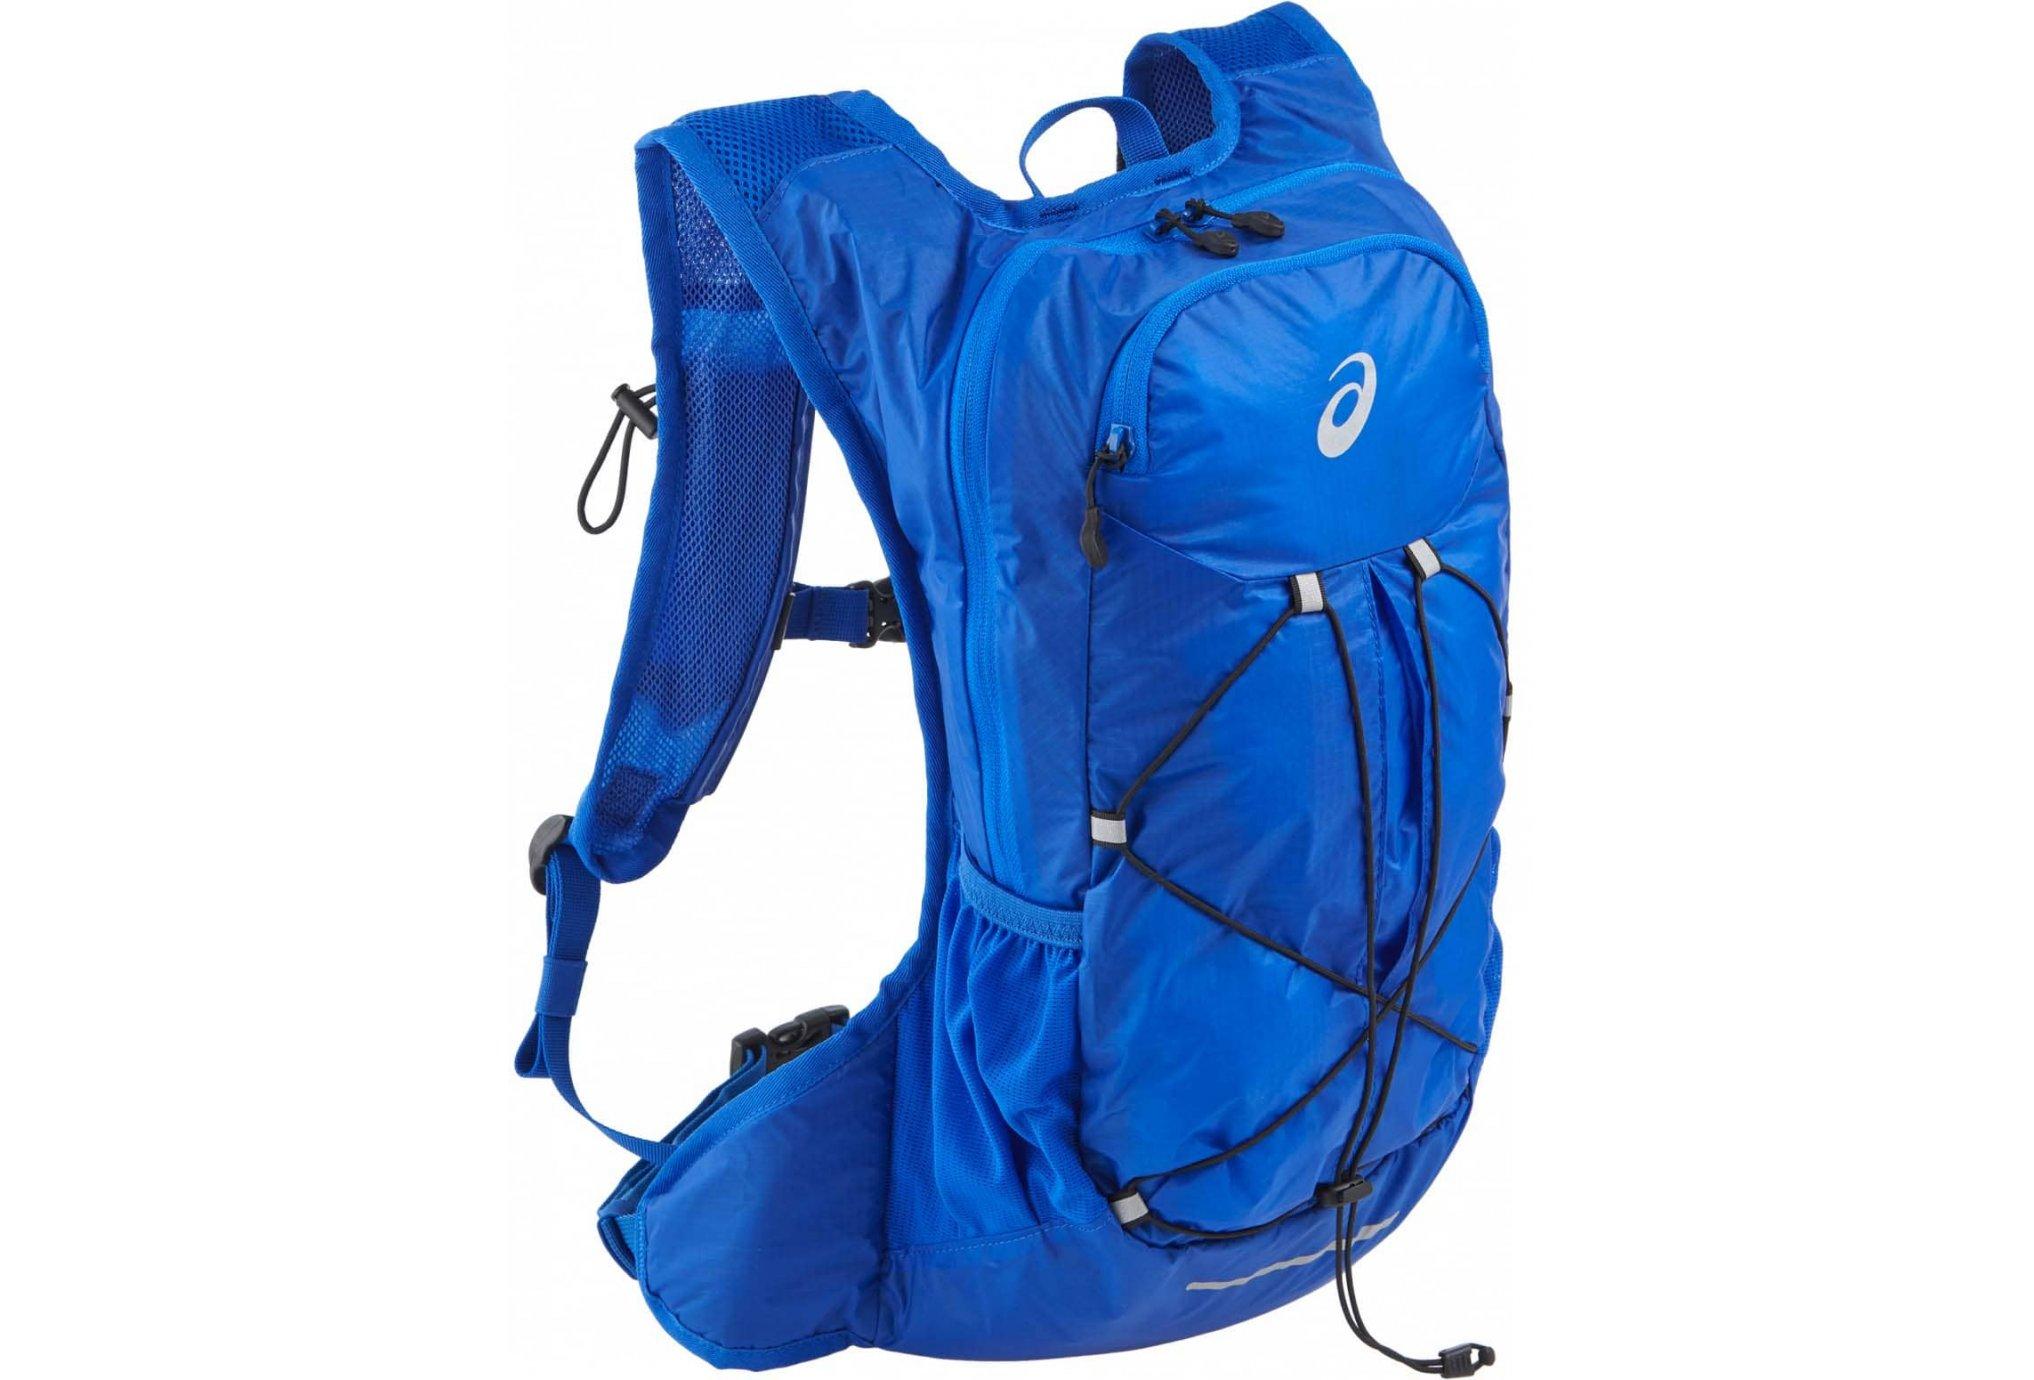 Asics Ligthweight Running Backpack Sac à dos